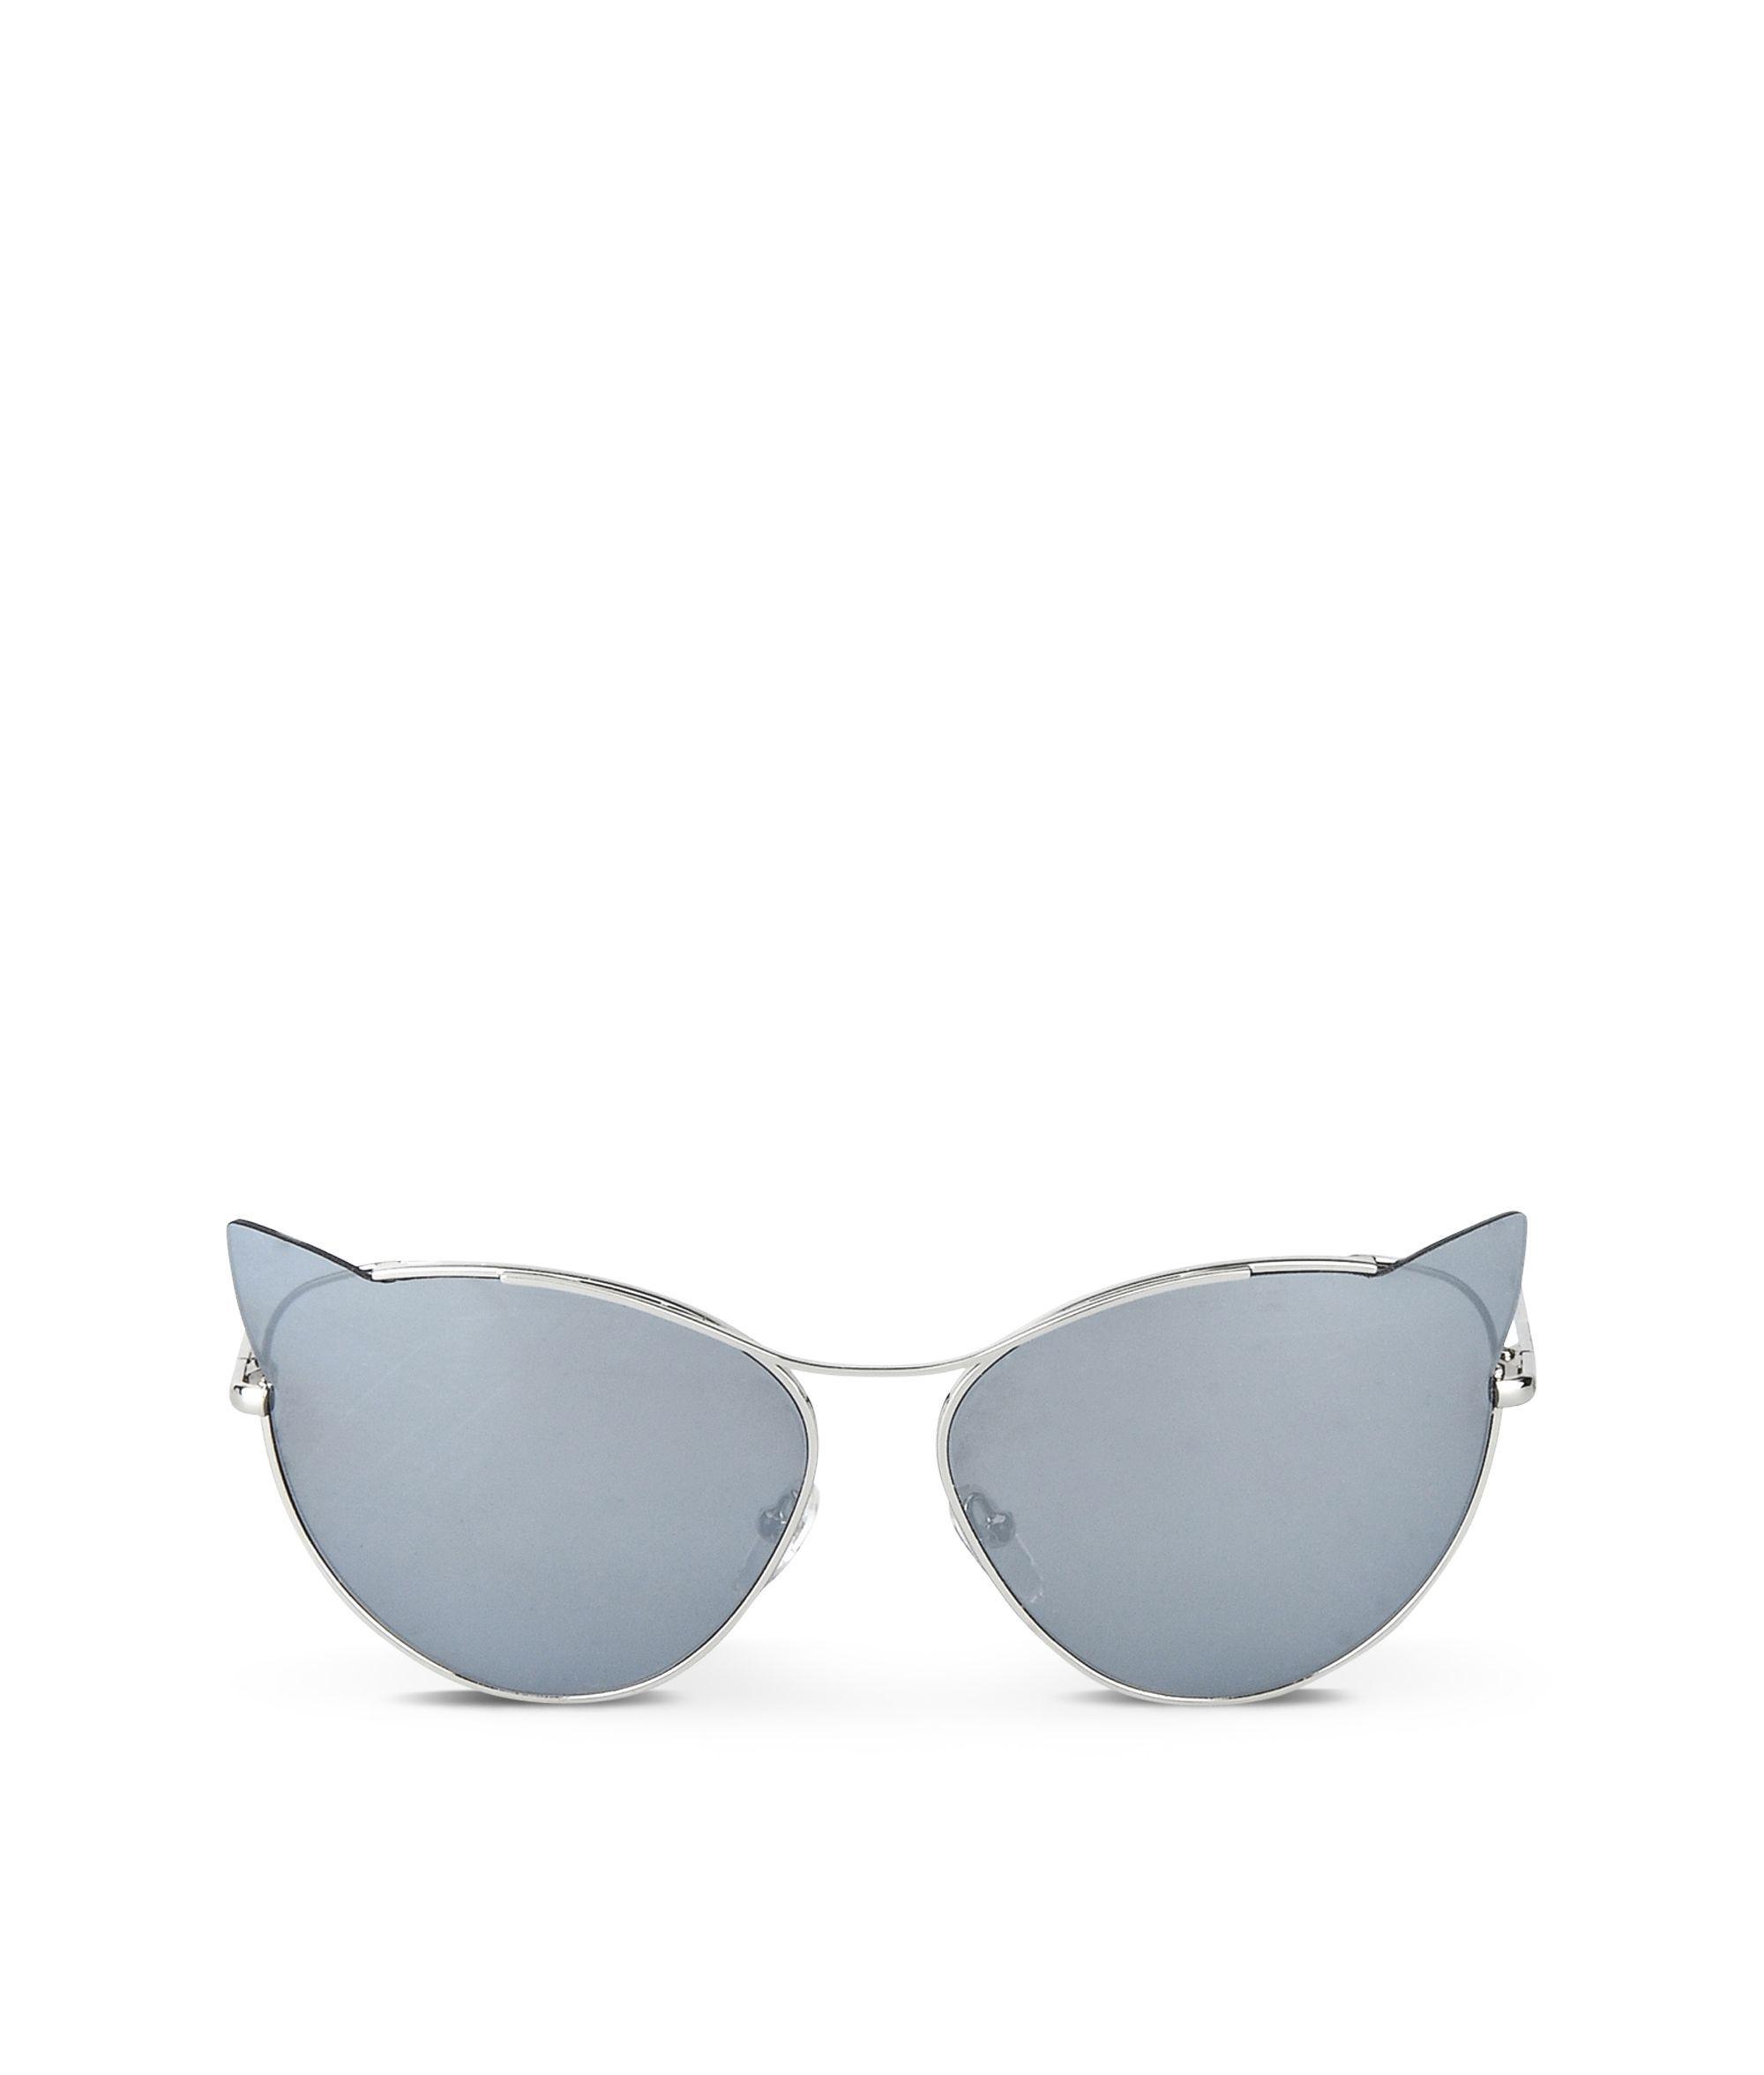 4b6bf889cb8 Reebok A3 Aviator Sunglasses (black) - Restaurant and Palinka Bar